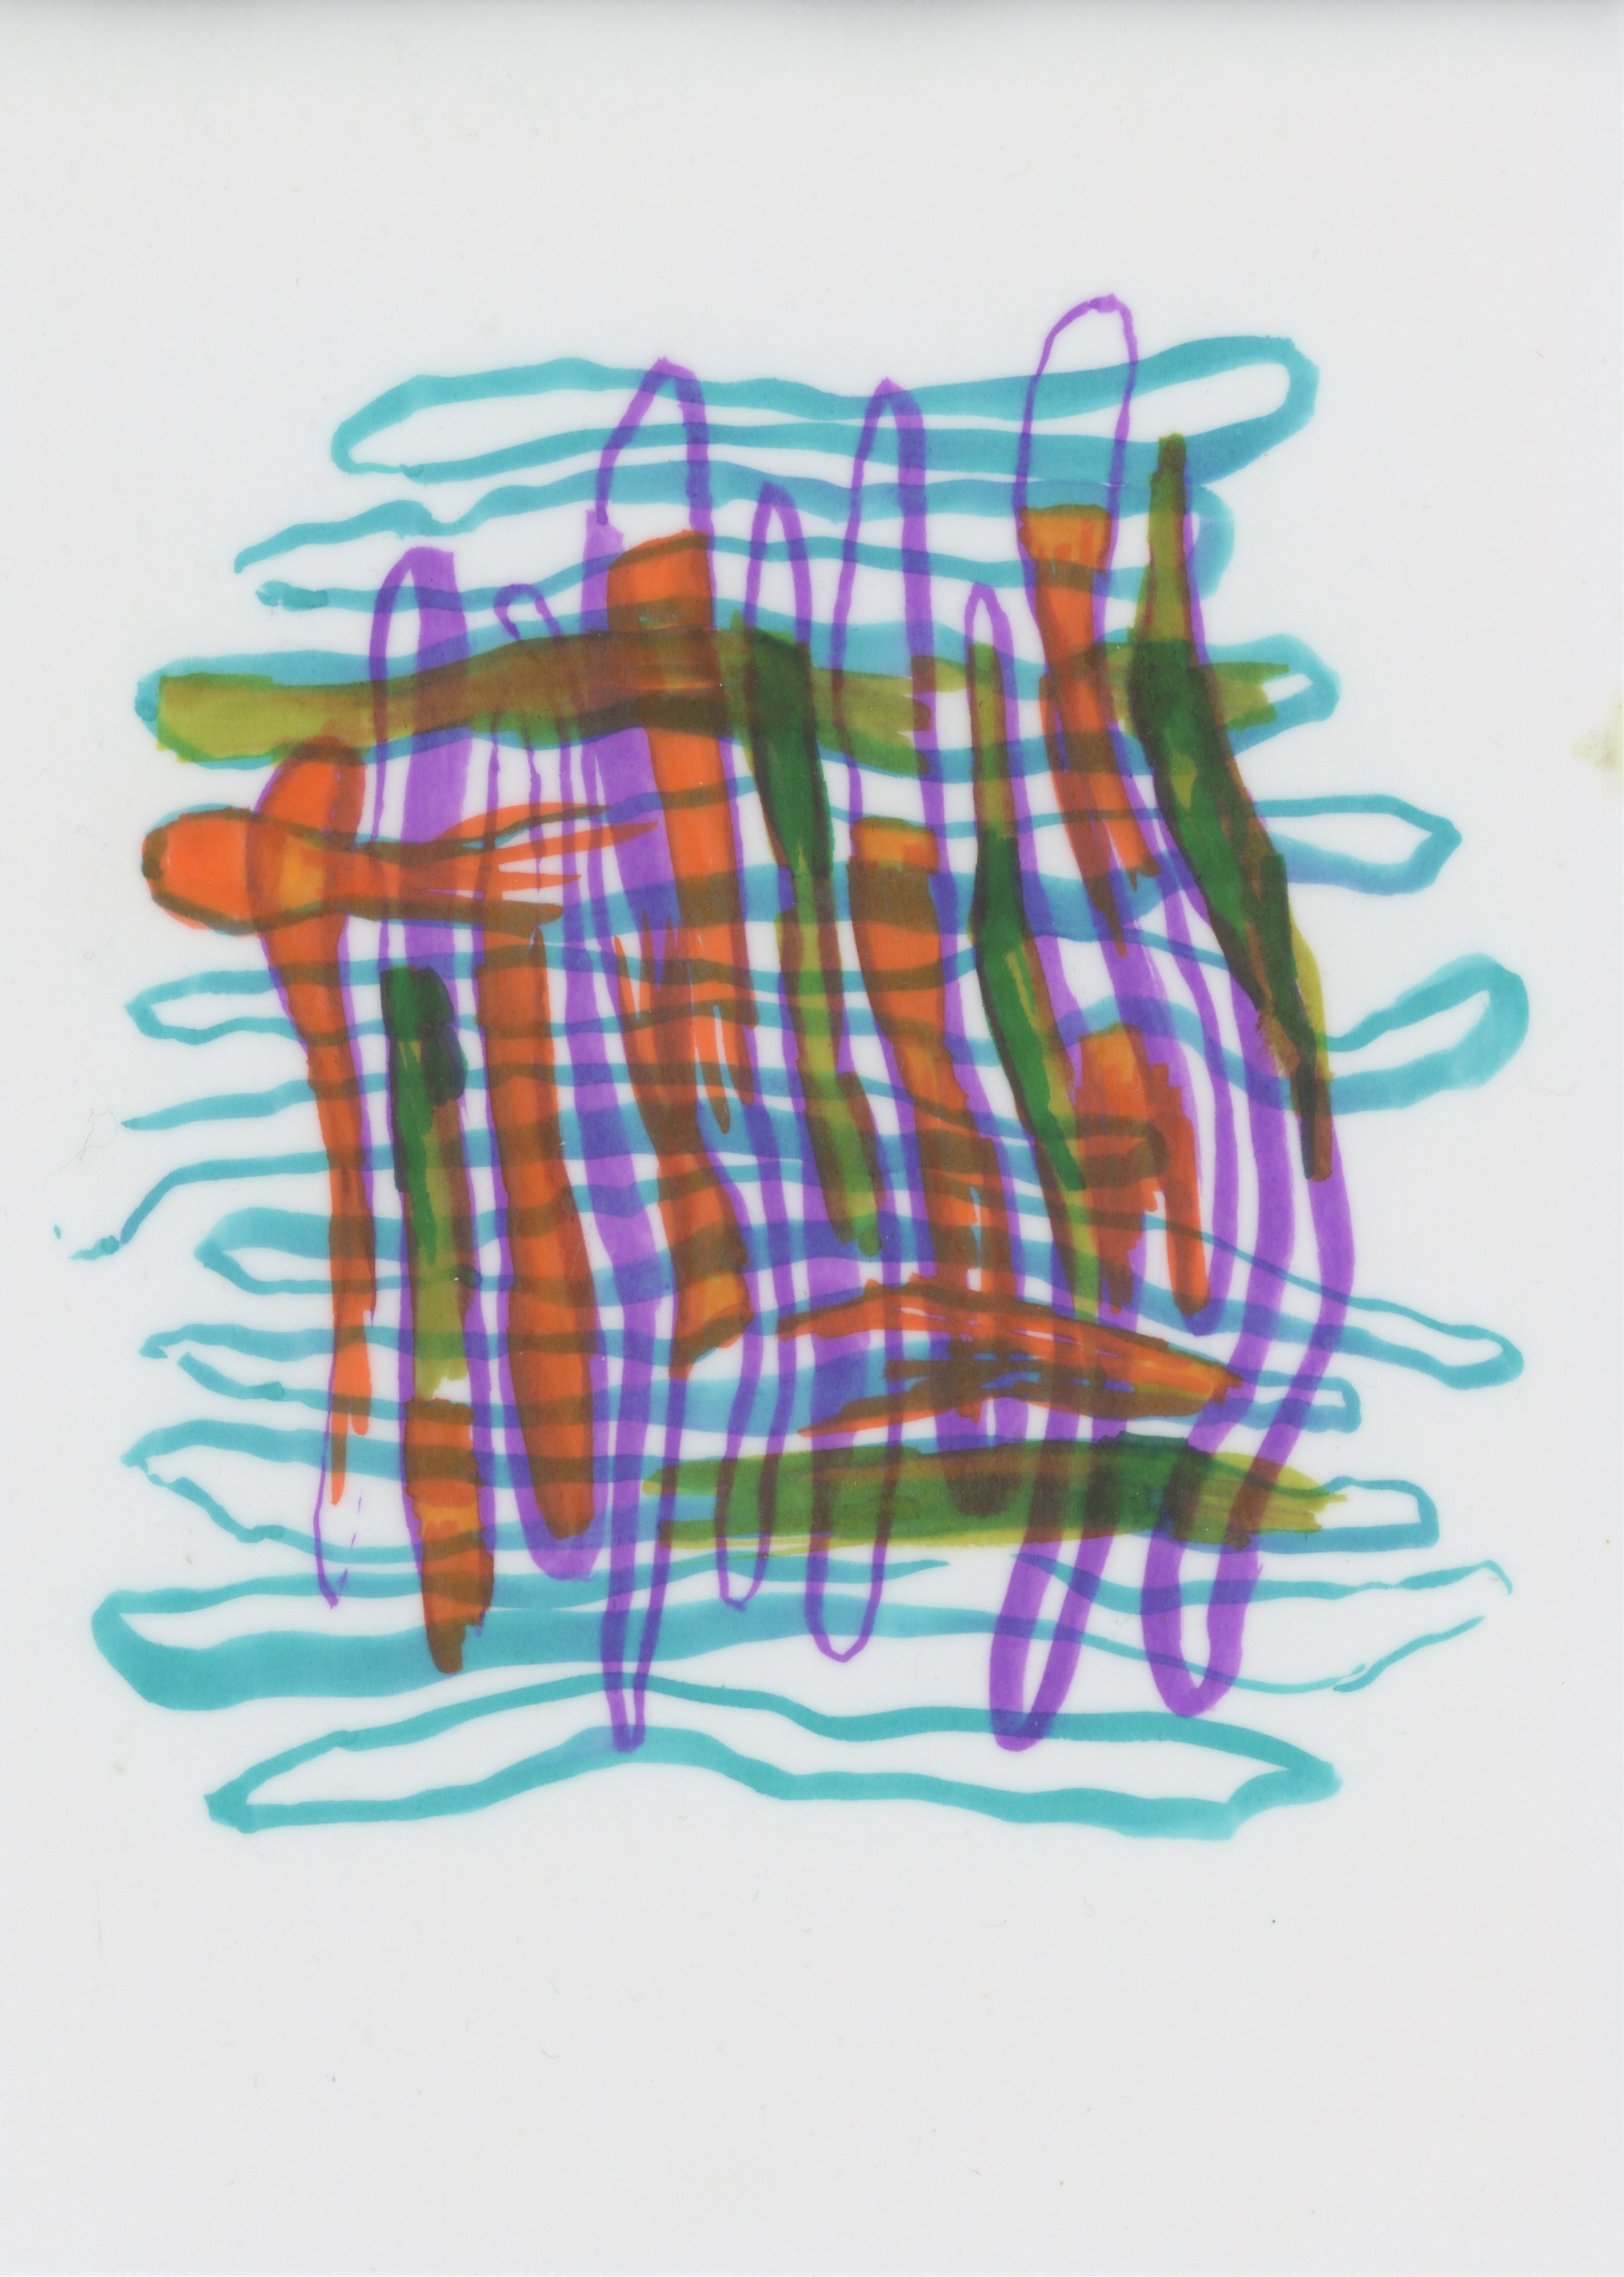 030518.60.Spineless.jpg